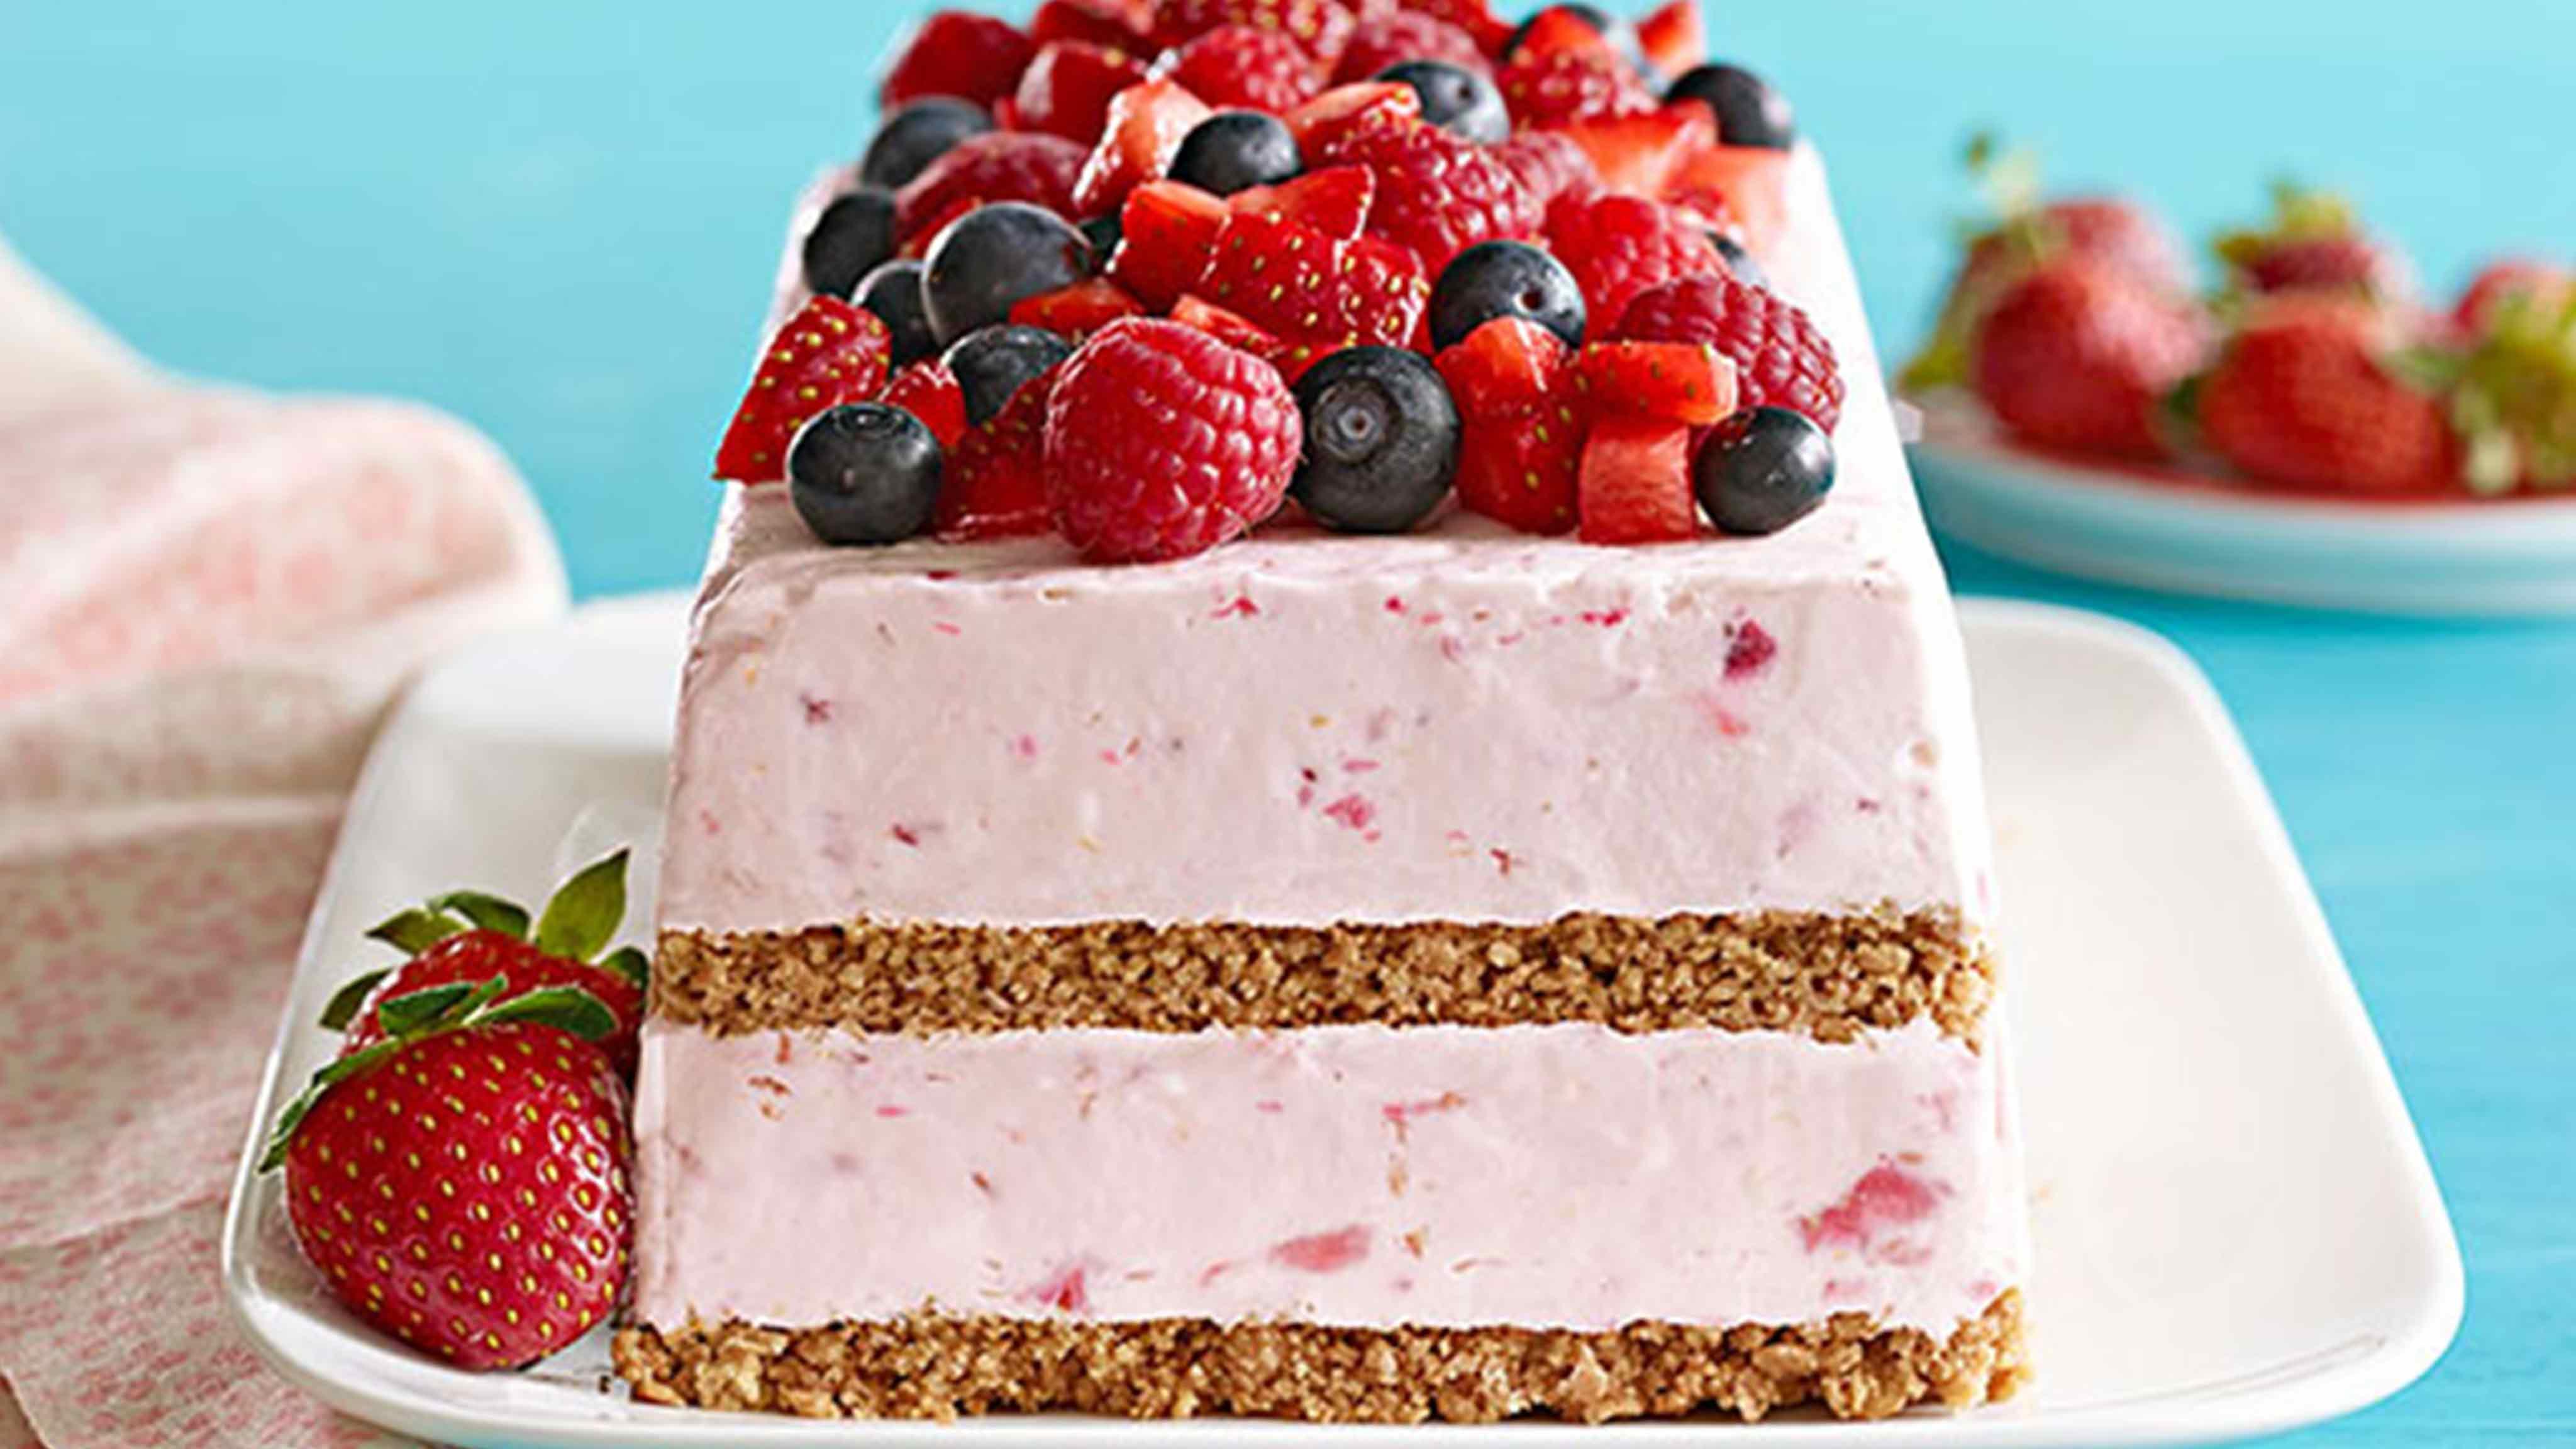 Image for Recipe Berry Frozen Dessert